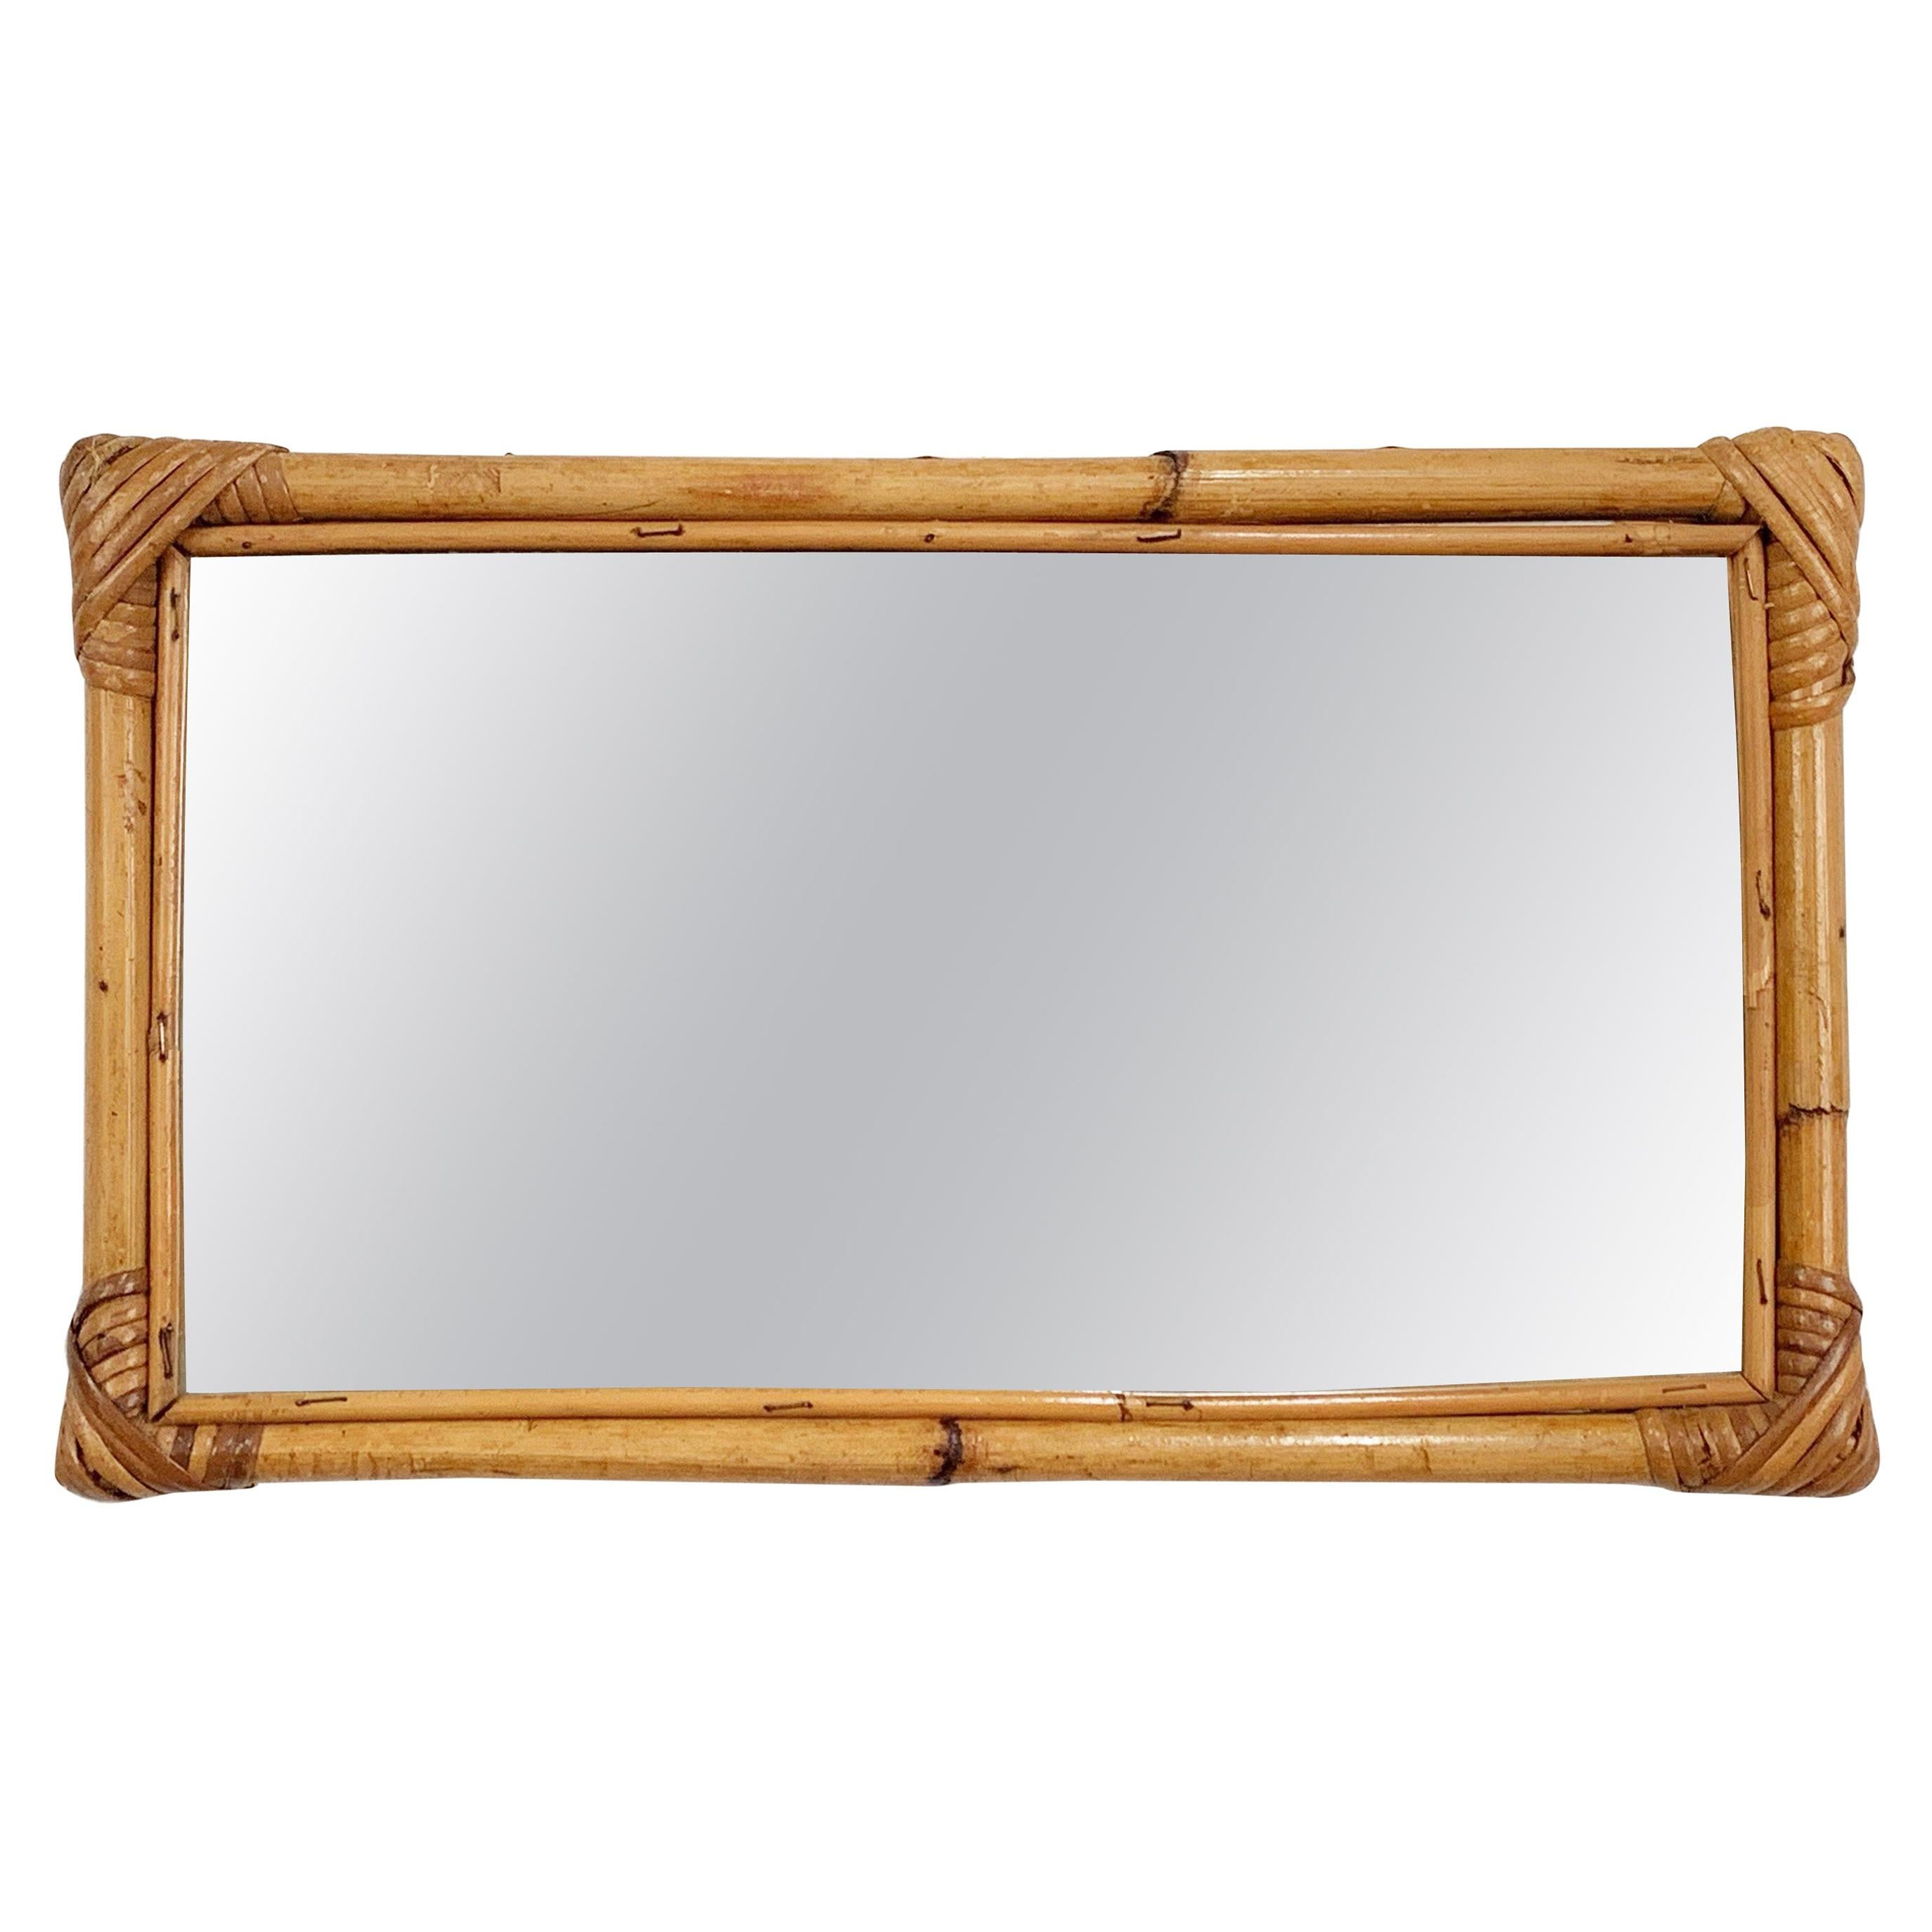 MIdcentury Rectangular Italian Mirror with Bamboo Wicker Woven Frame, 1970s